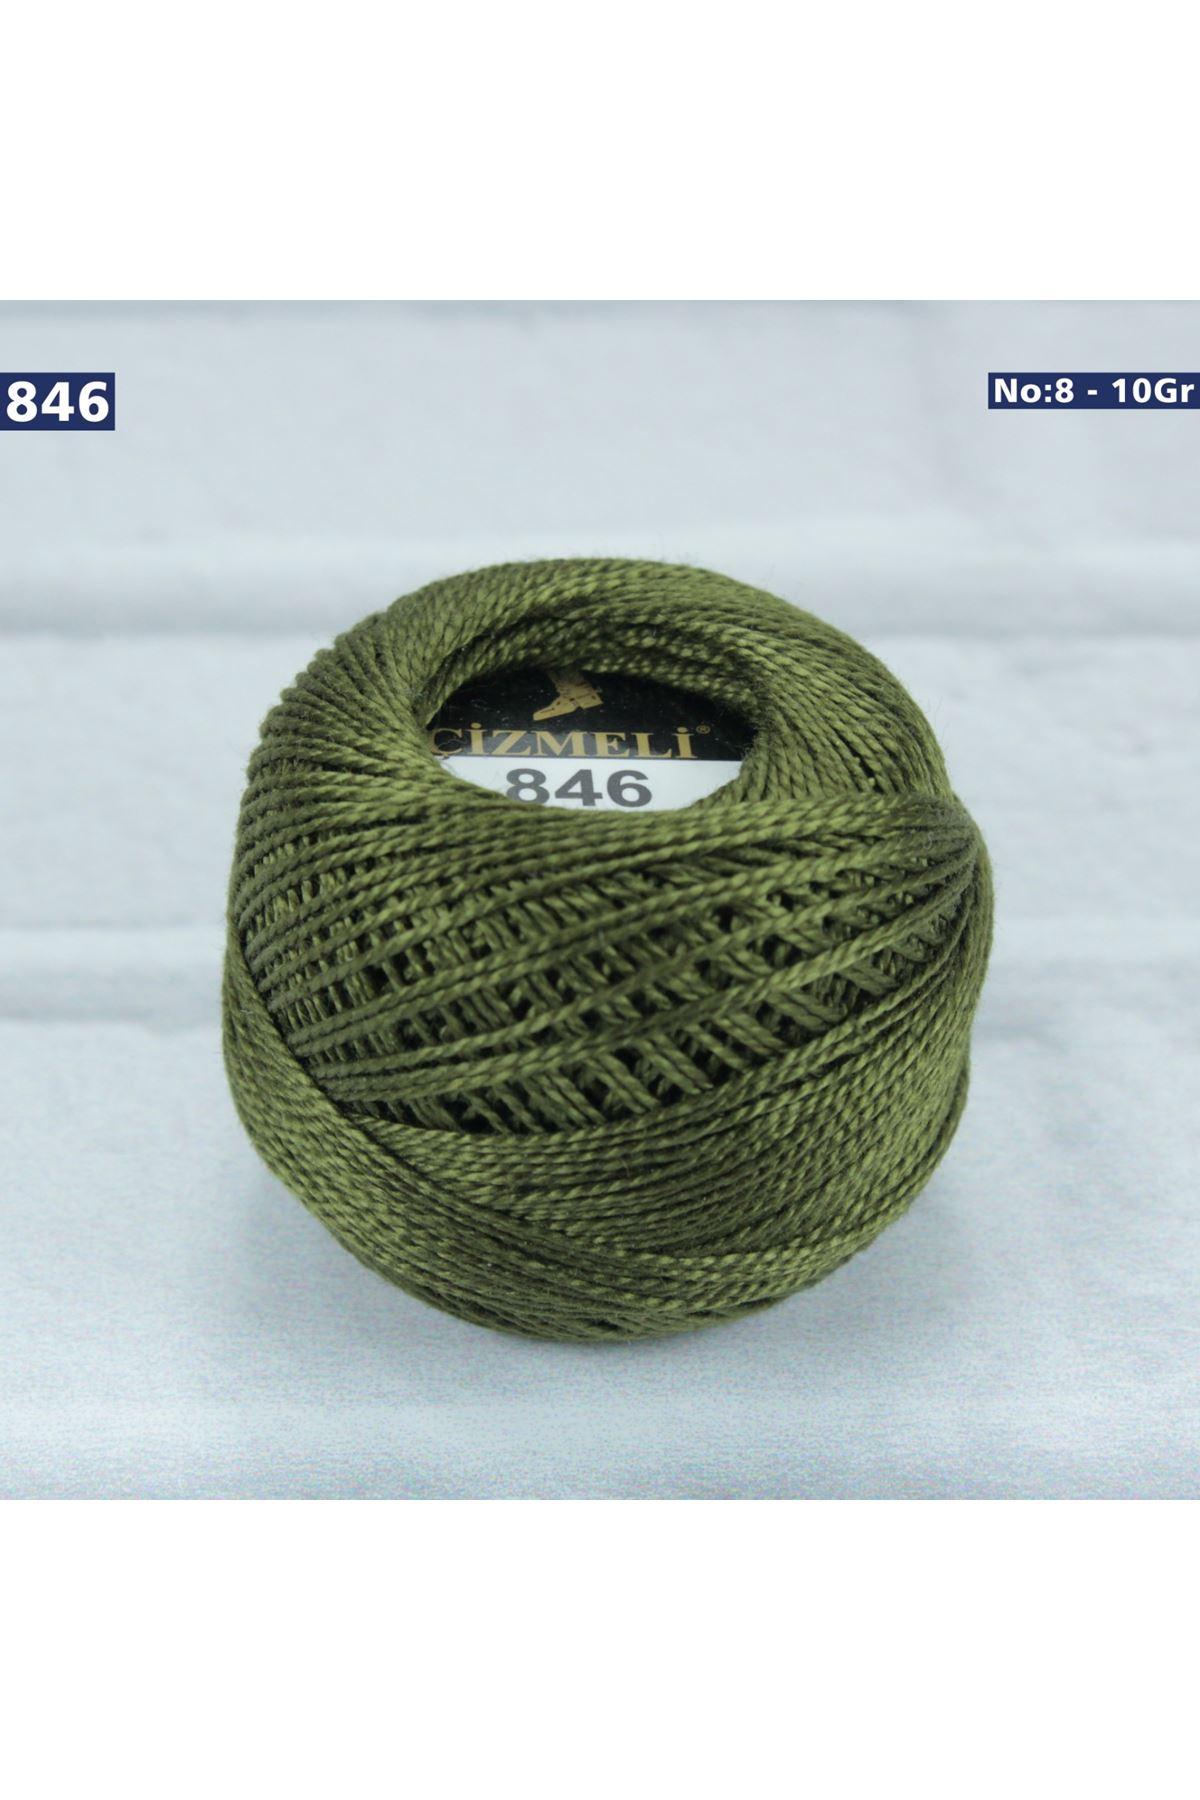 Çizmeli Cotton Perle Nakış İpliği No: 846